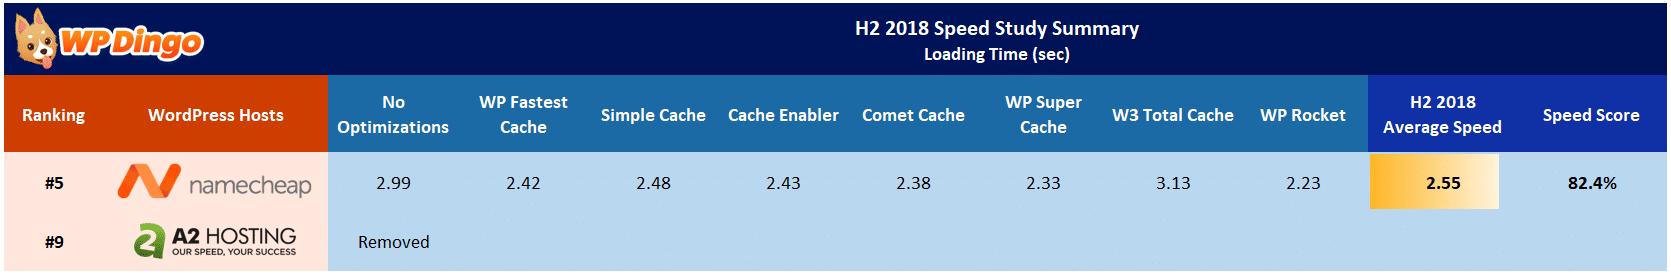 Namecheap vs A2 Hosting Speed Table - Jul 2018 to Dec 2018